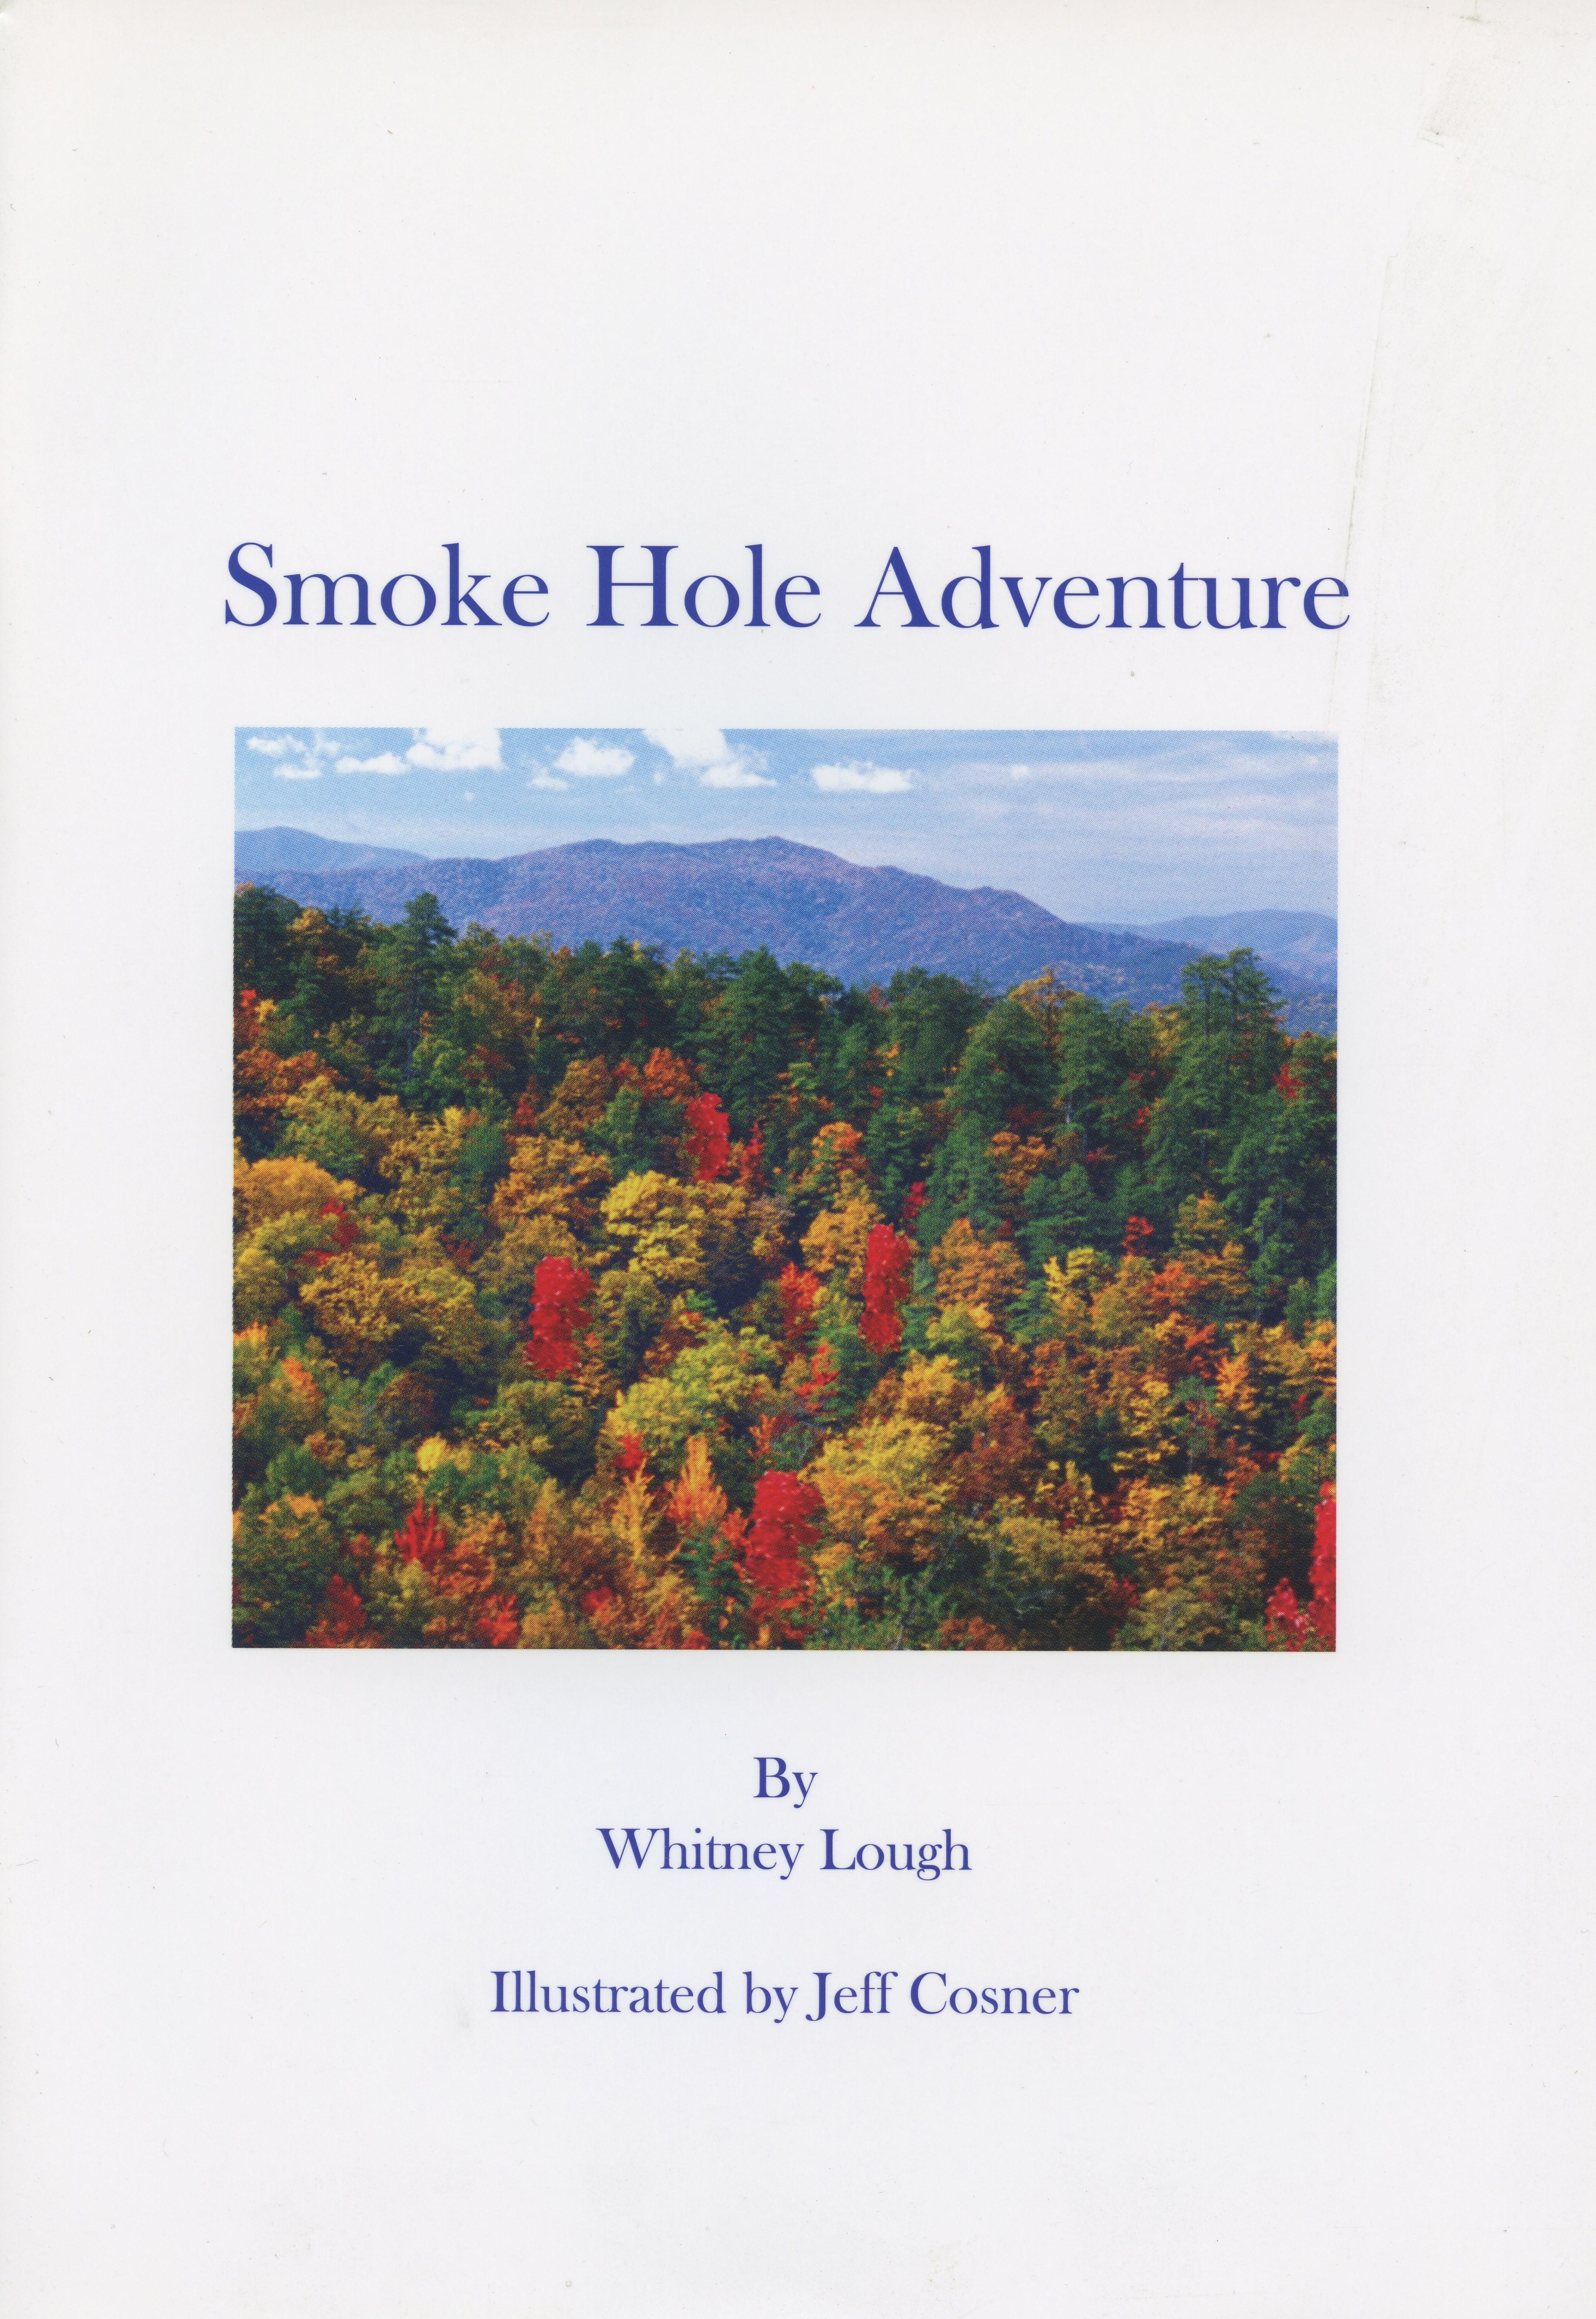 Smoke Hole Adventure